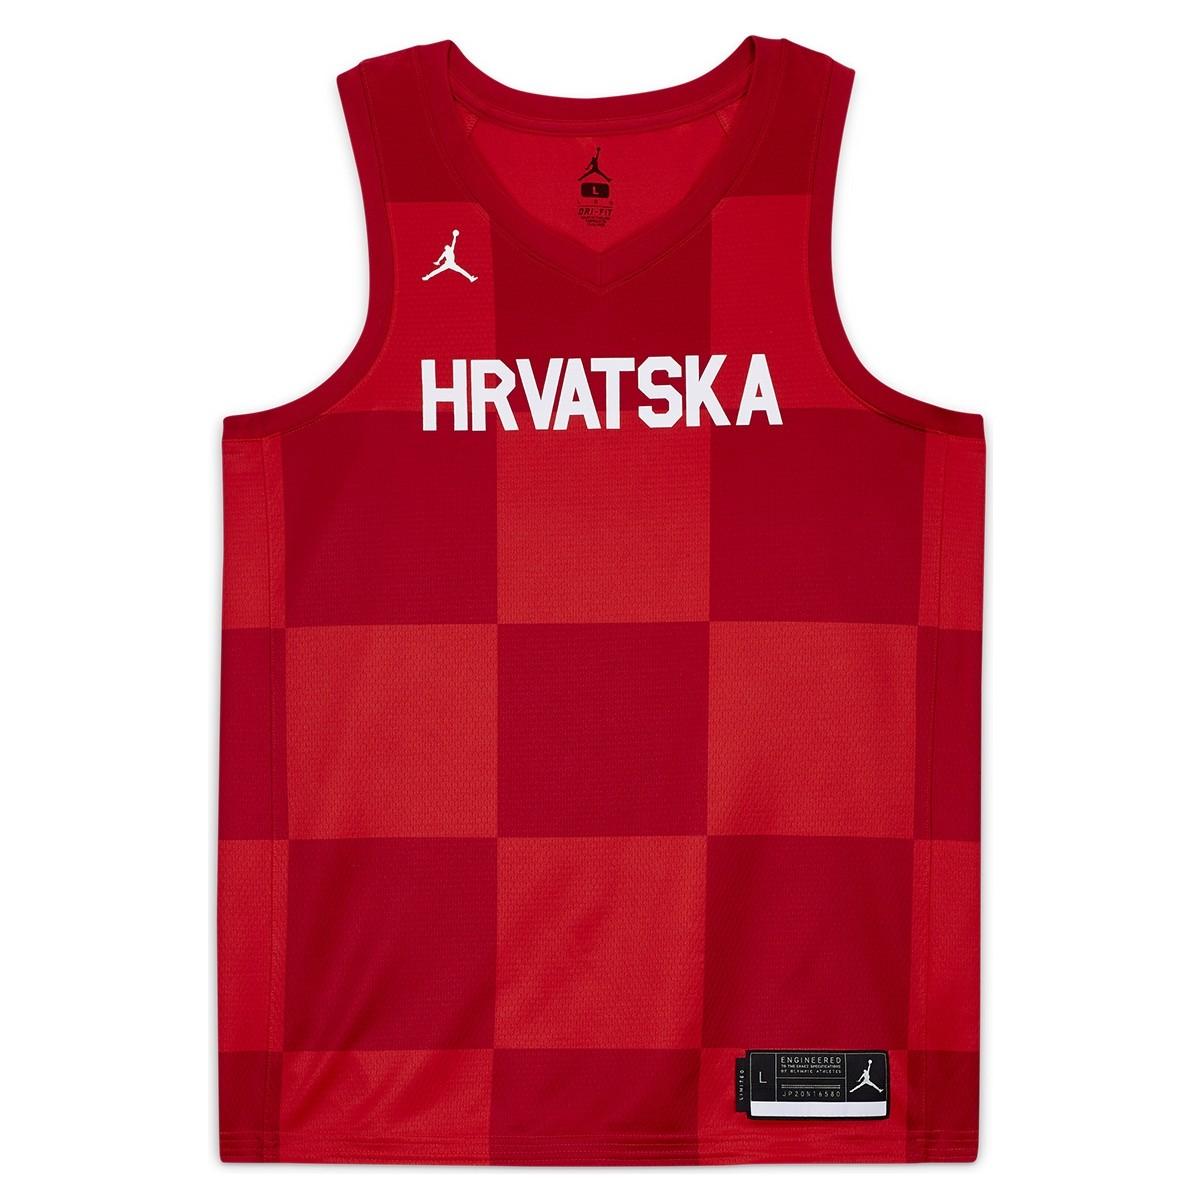 Jordan Croacia Olympics Jersey Tokyo 2020 'Red'